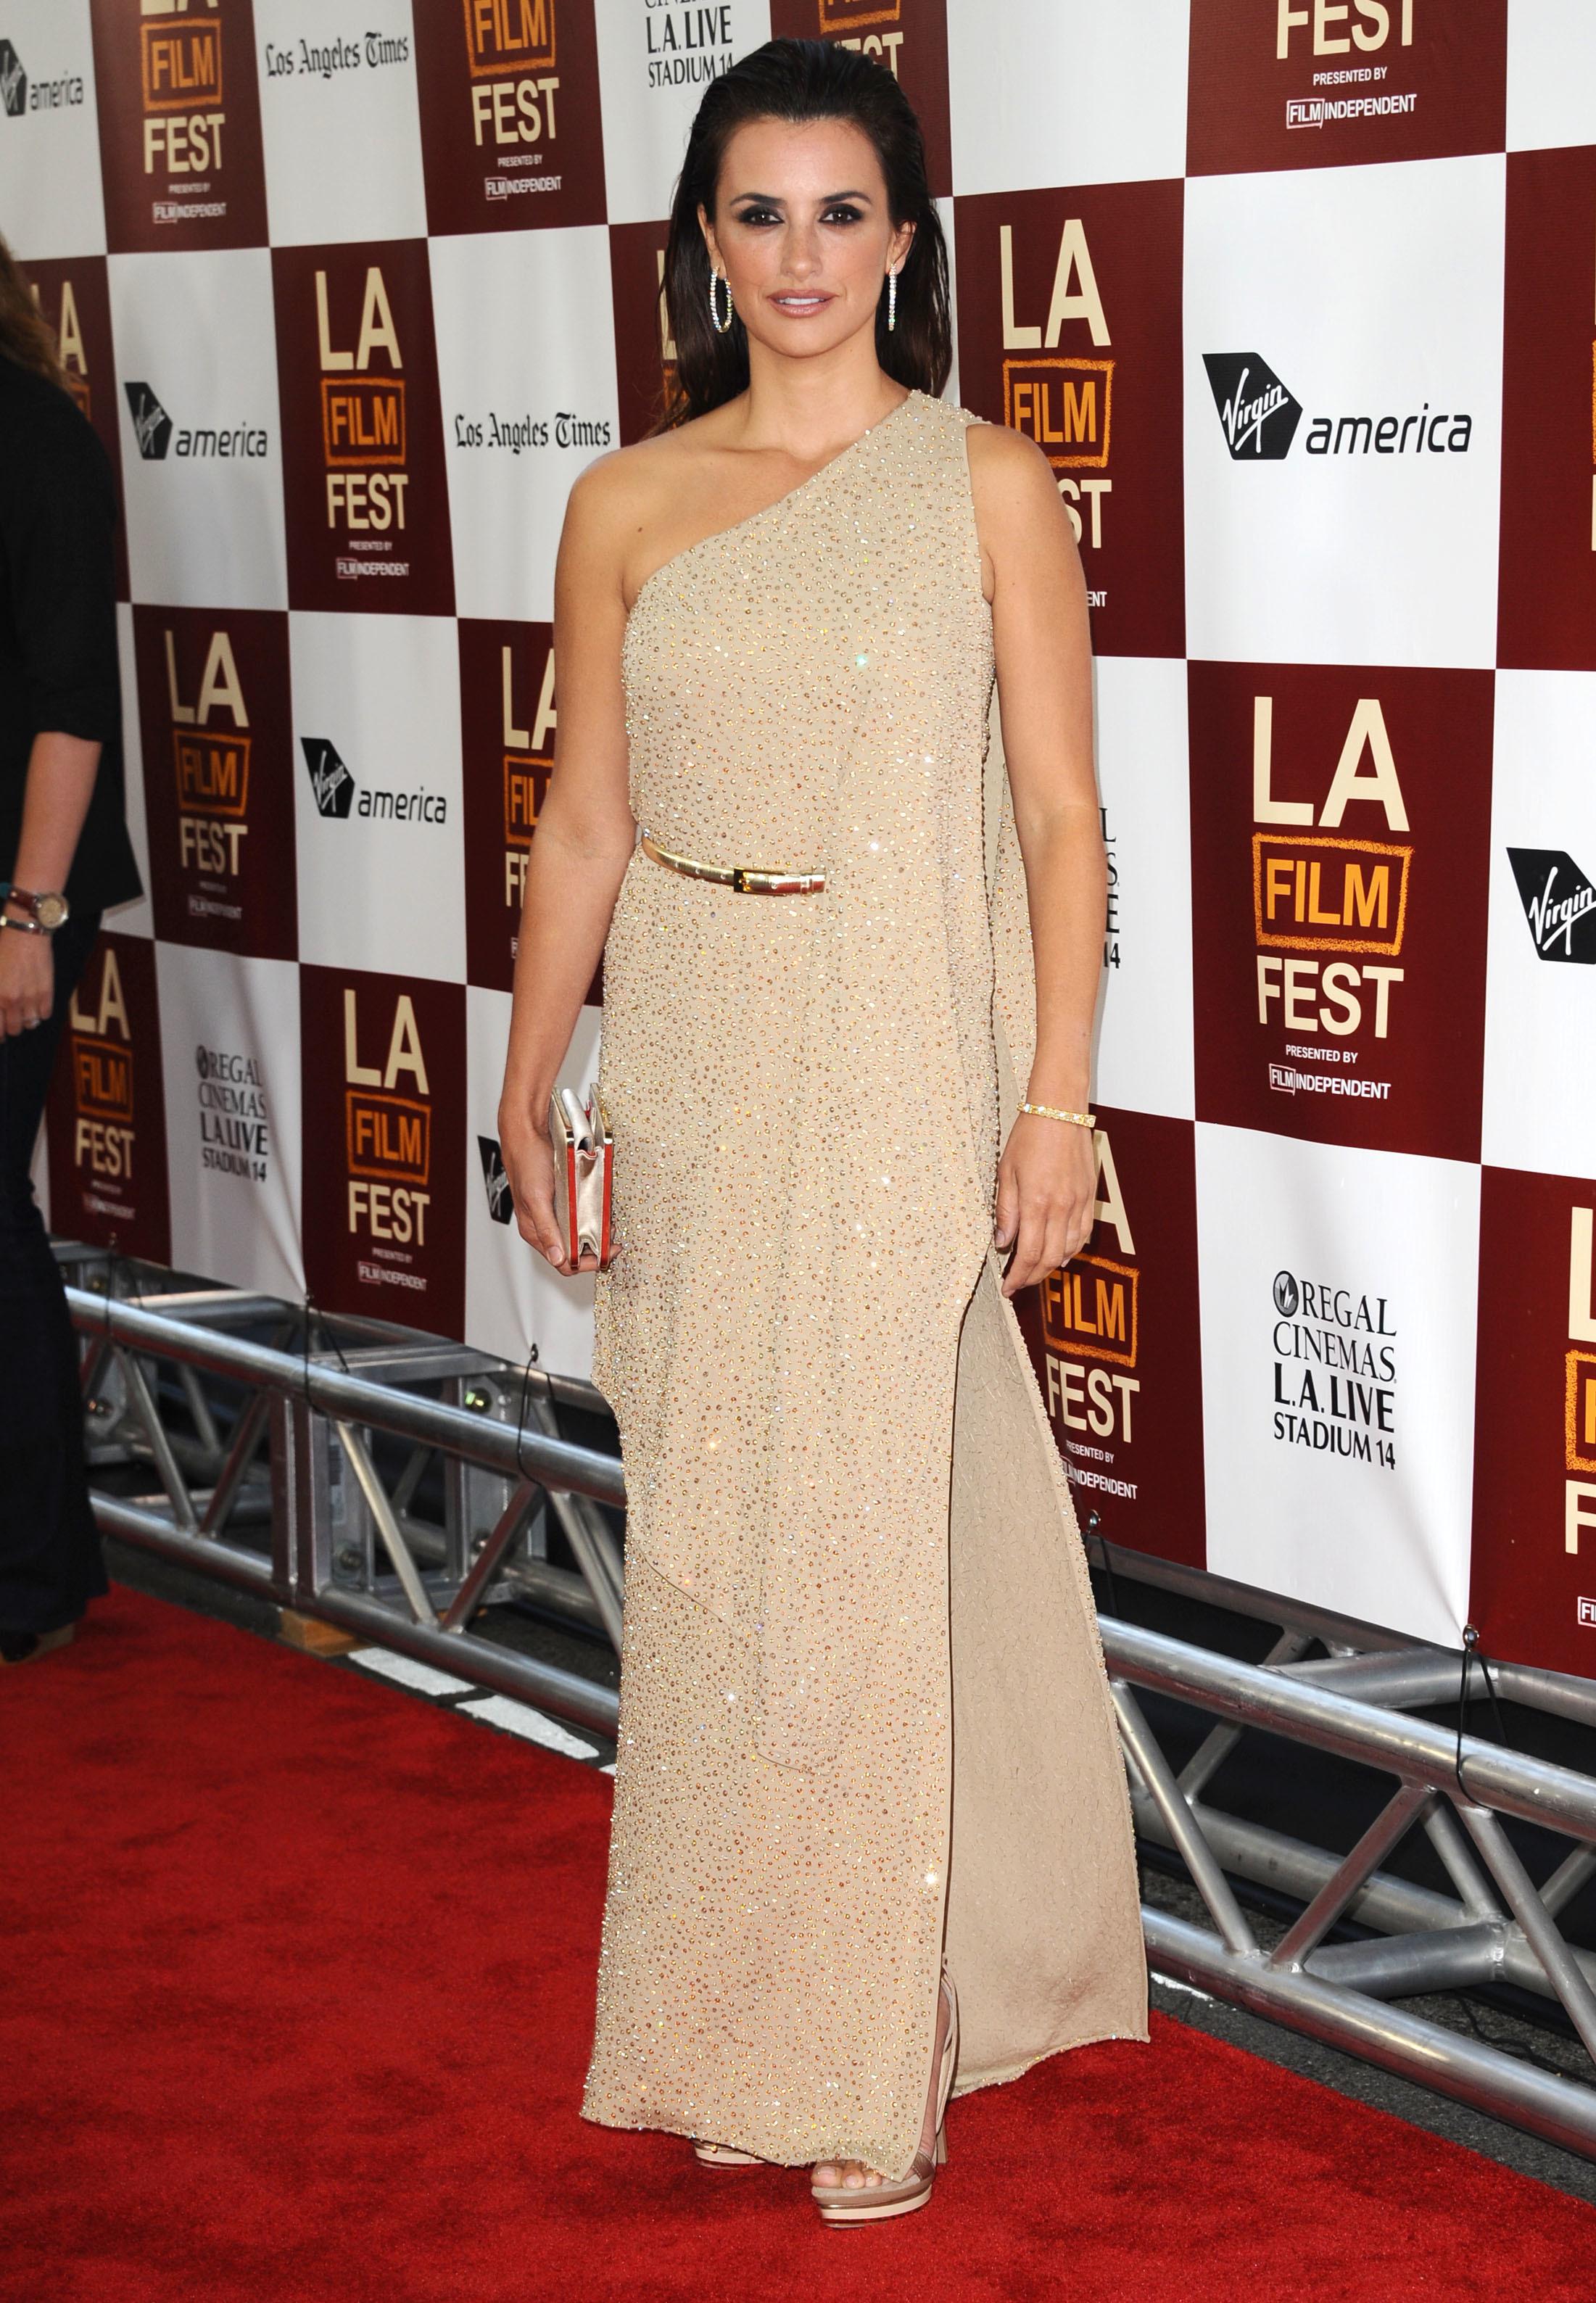 Penelope Cruz glittery dress